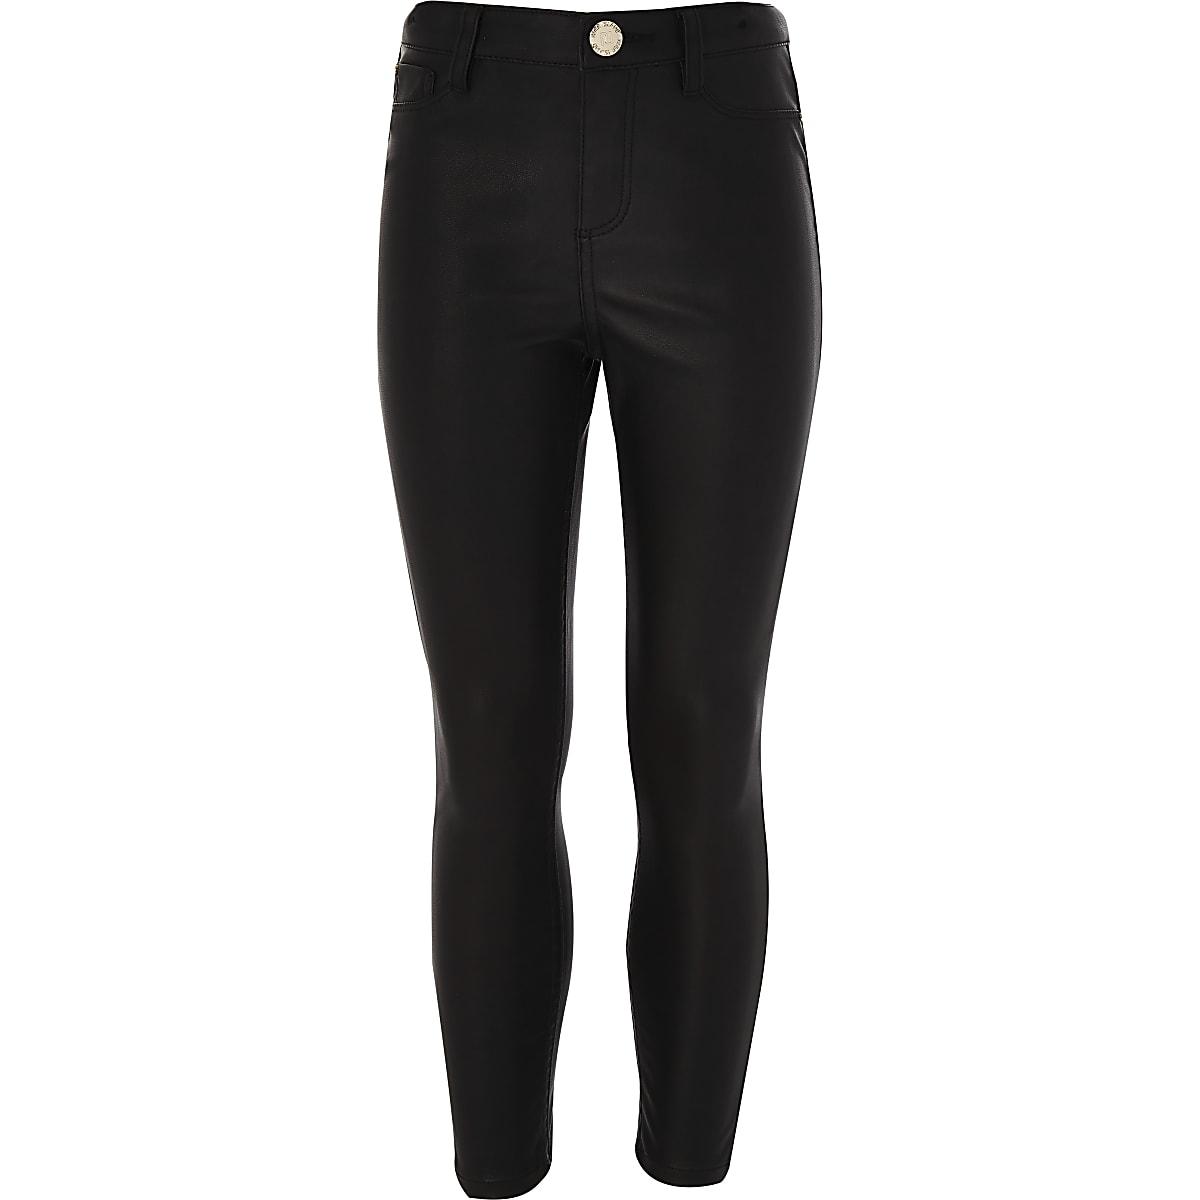 cf84d4bfa7f0 Girls black PU trouser - Skinny Jeans - Jeans - girls